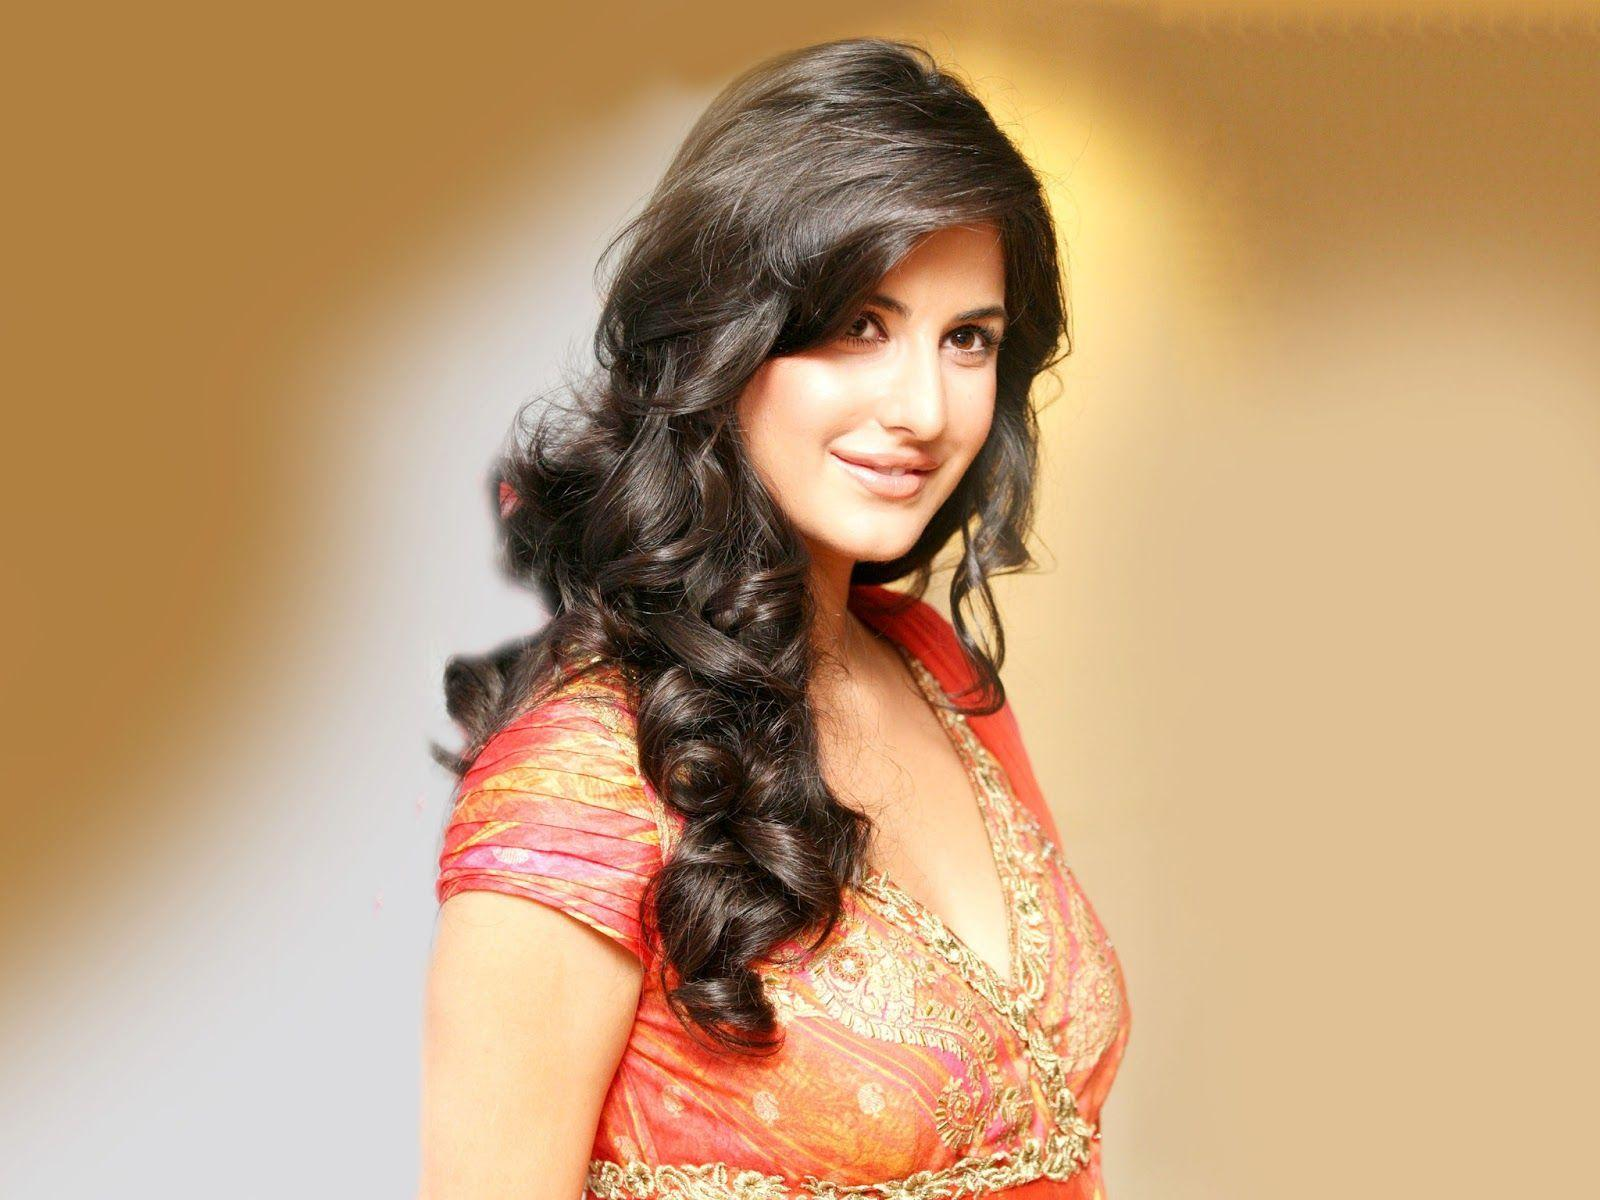 Bollywood Actress Hd Wallpapers Hollywood Actress Hd: Full HD Wallpapers Bollywood Actress